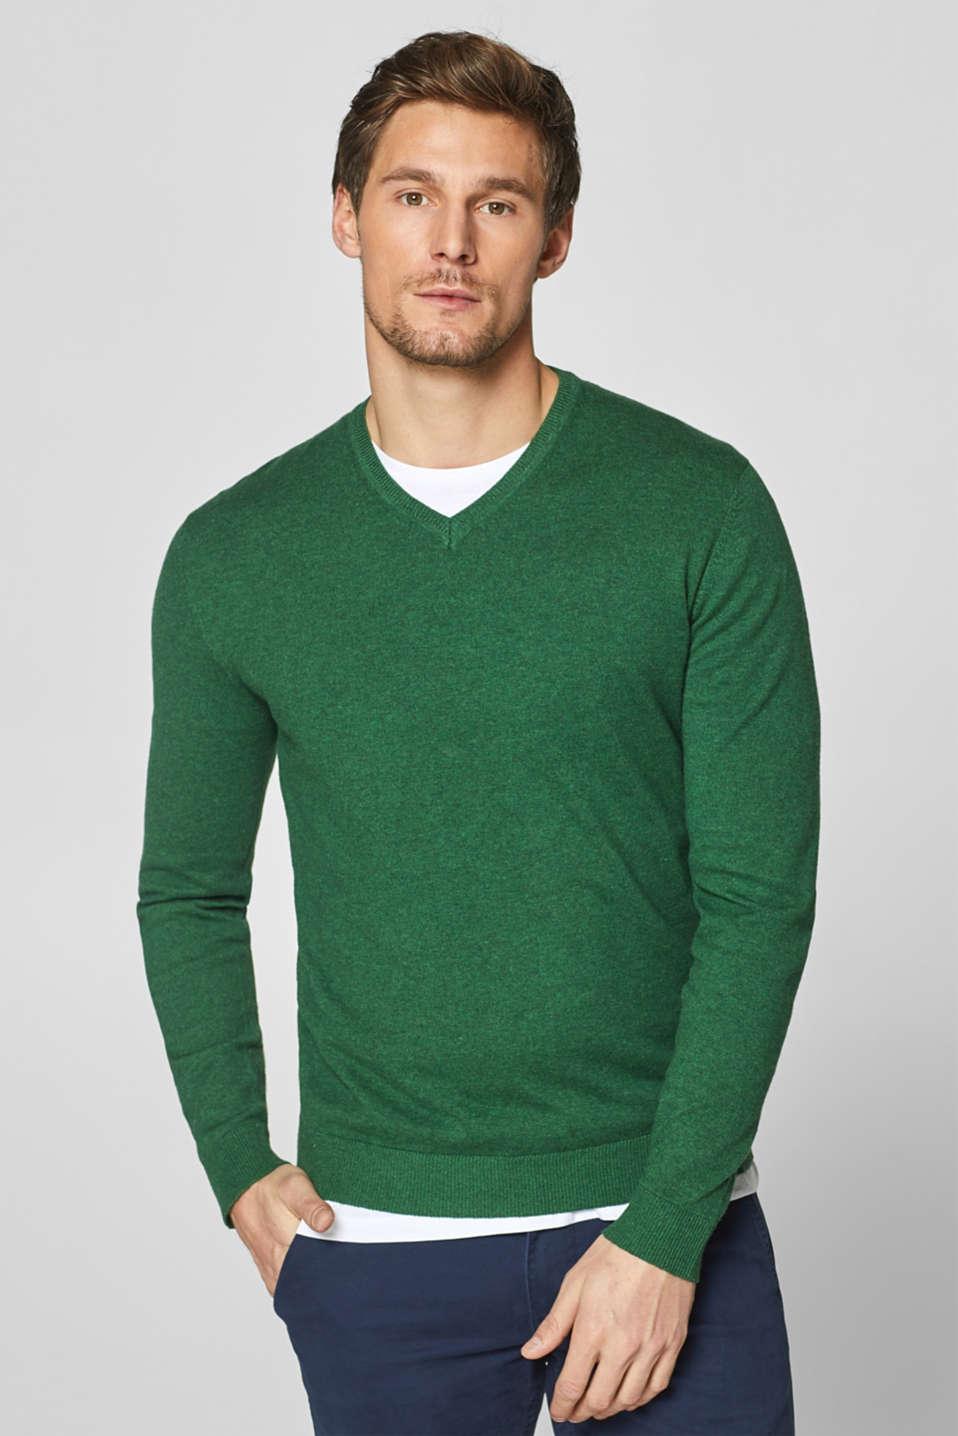 Esprit With cashmere: fine knit jumper at our Online Shop